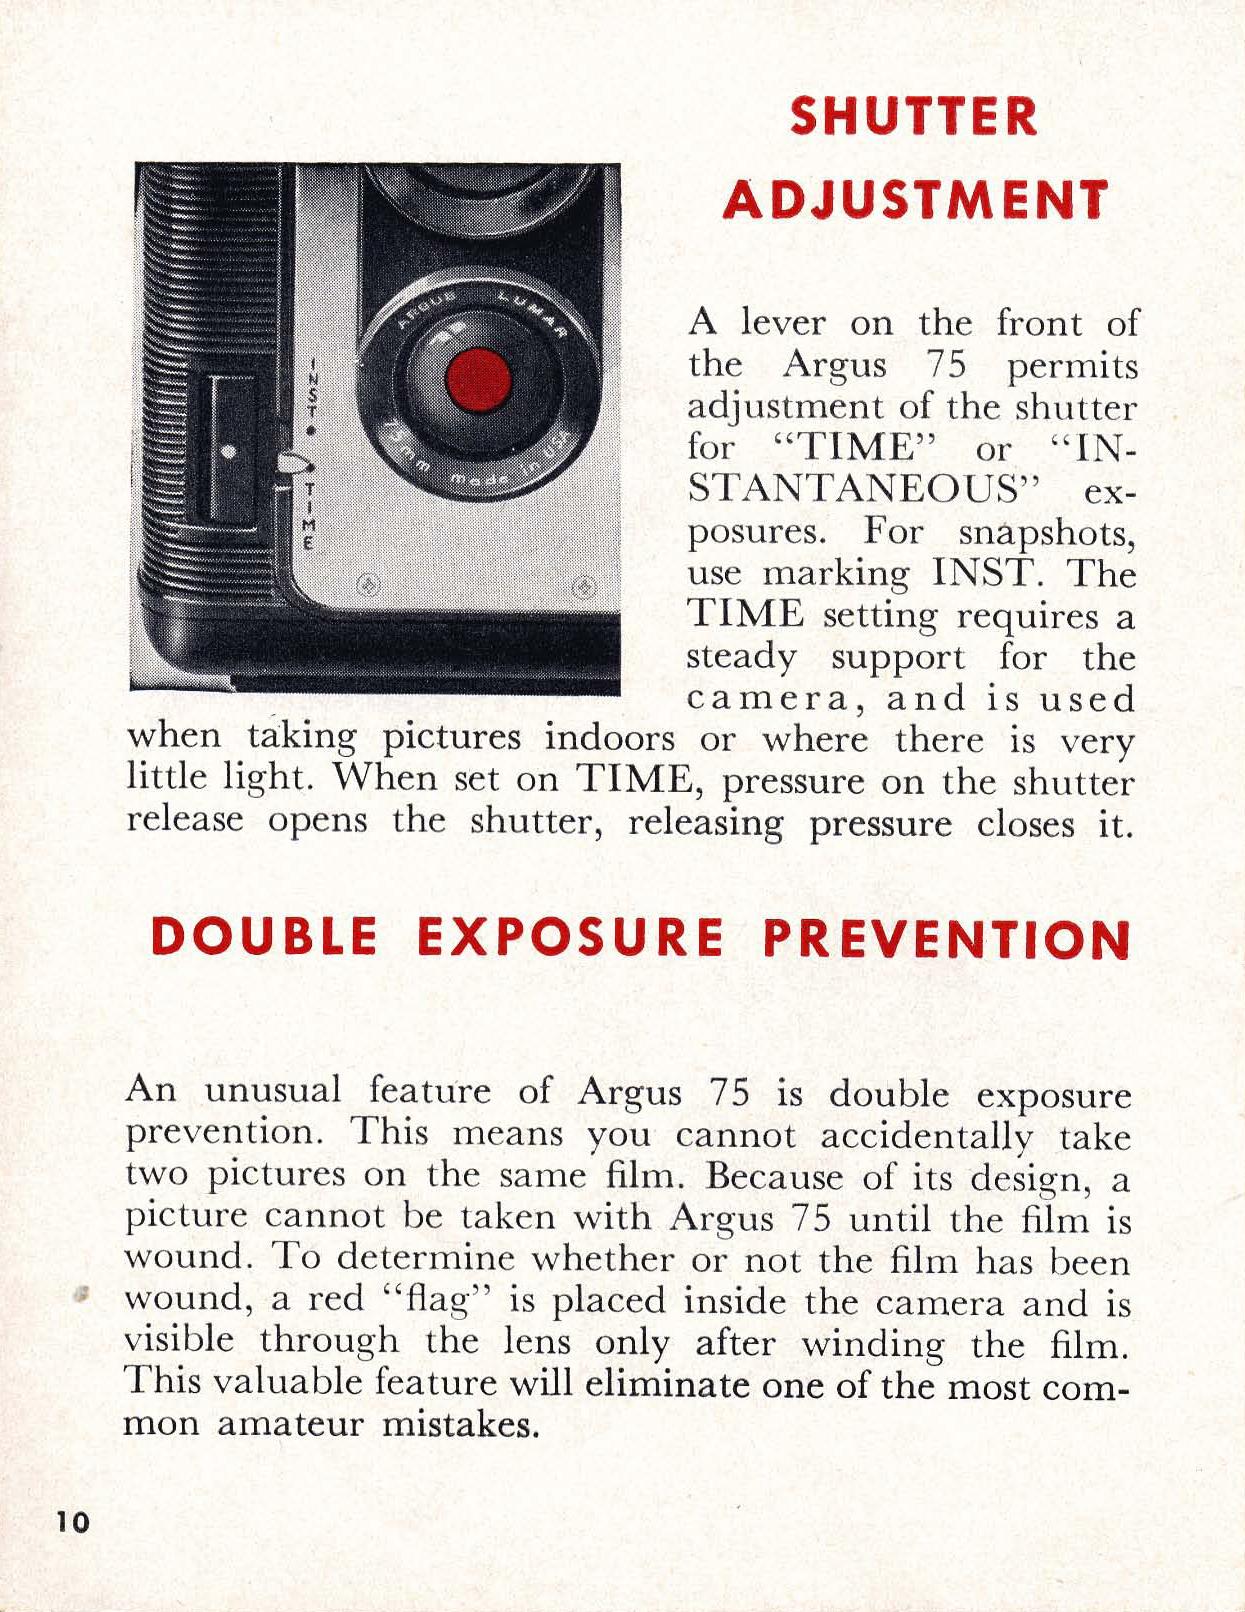 argus 75 camera manual best setting instruction guide u2022 rh ourk9 co Vintage Argus Camera $75 Vintage Argus Camera